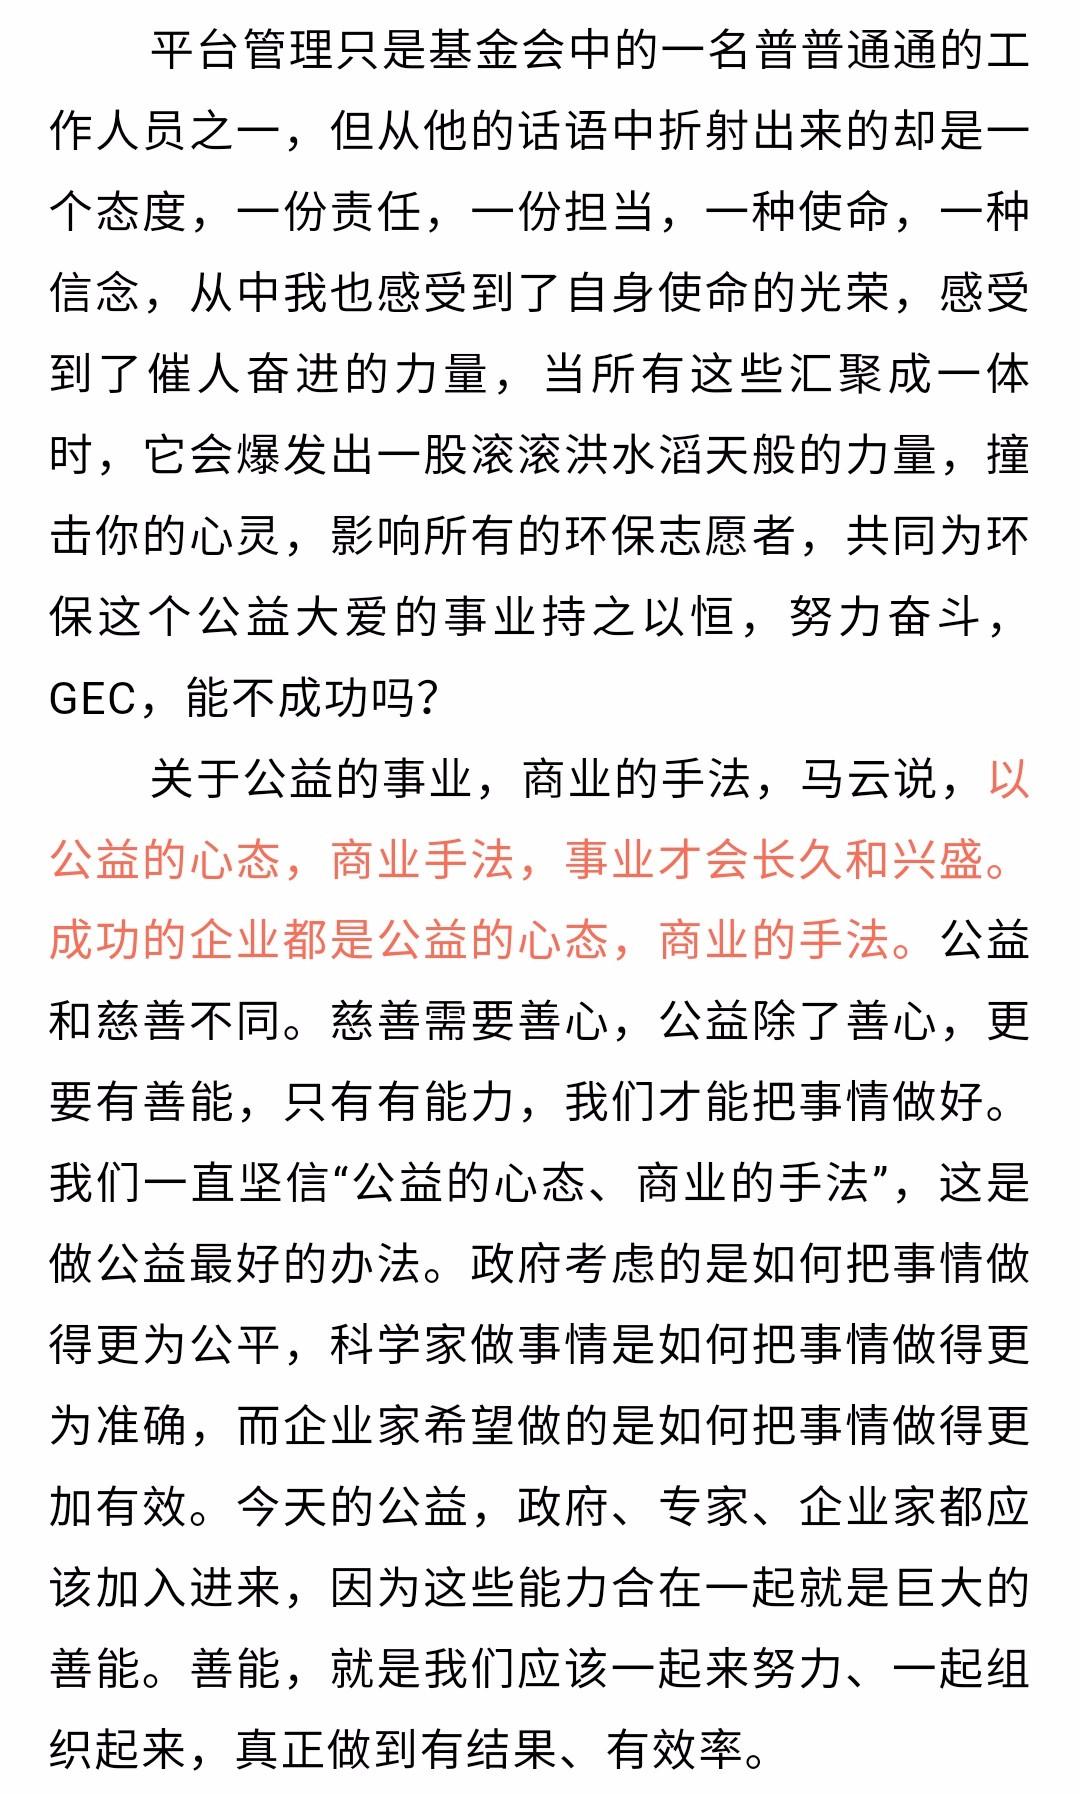 GEC环保创业币|GC环保链|EC创业链|世界环保创业基金会